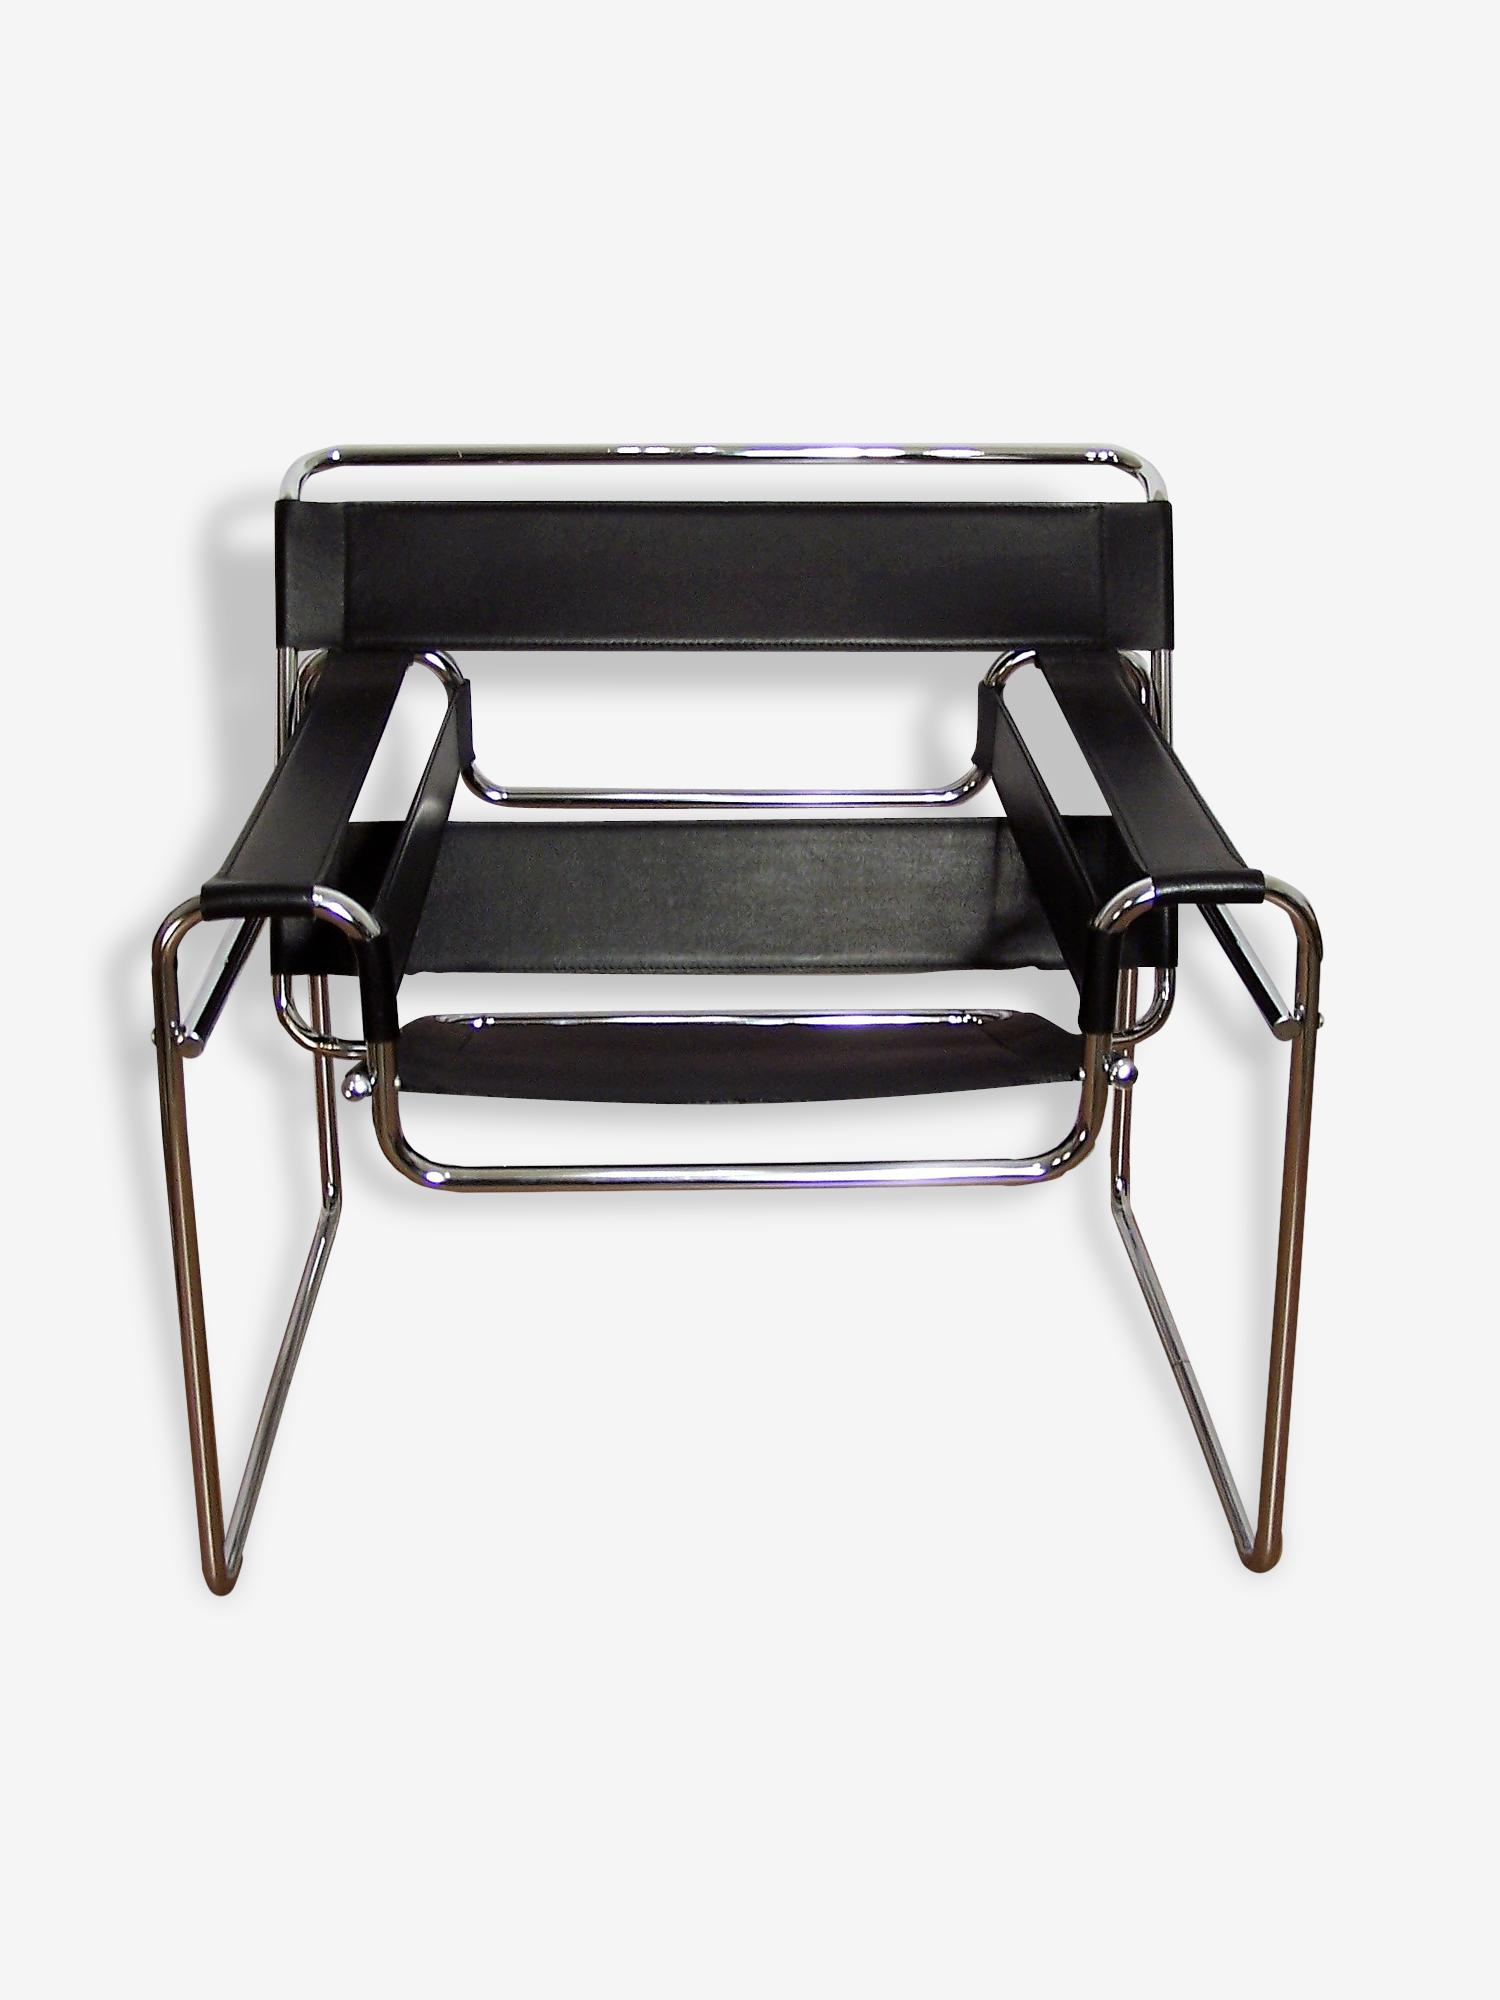 Fauteuil Wassily B3 design Marcel Breuer cuir noir cuir noir